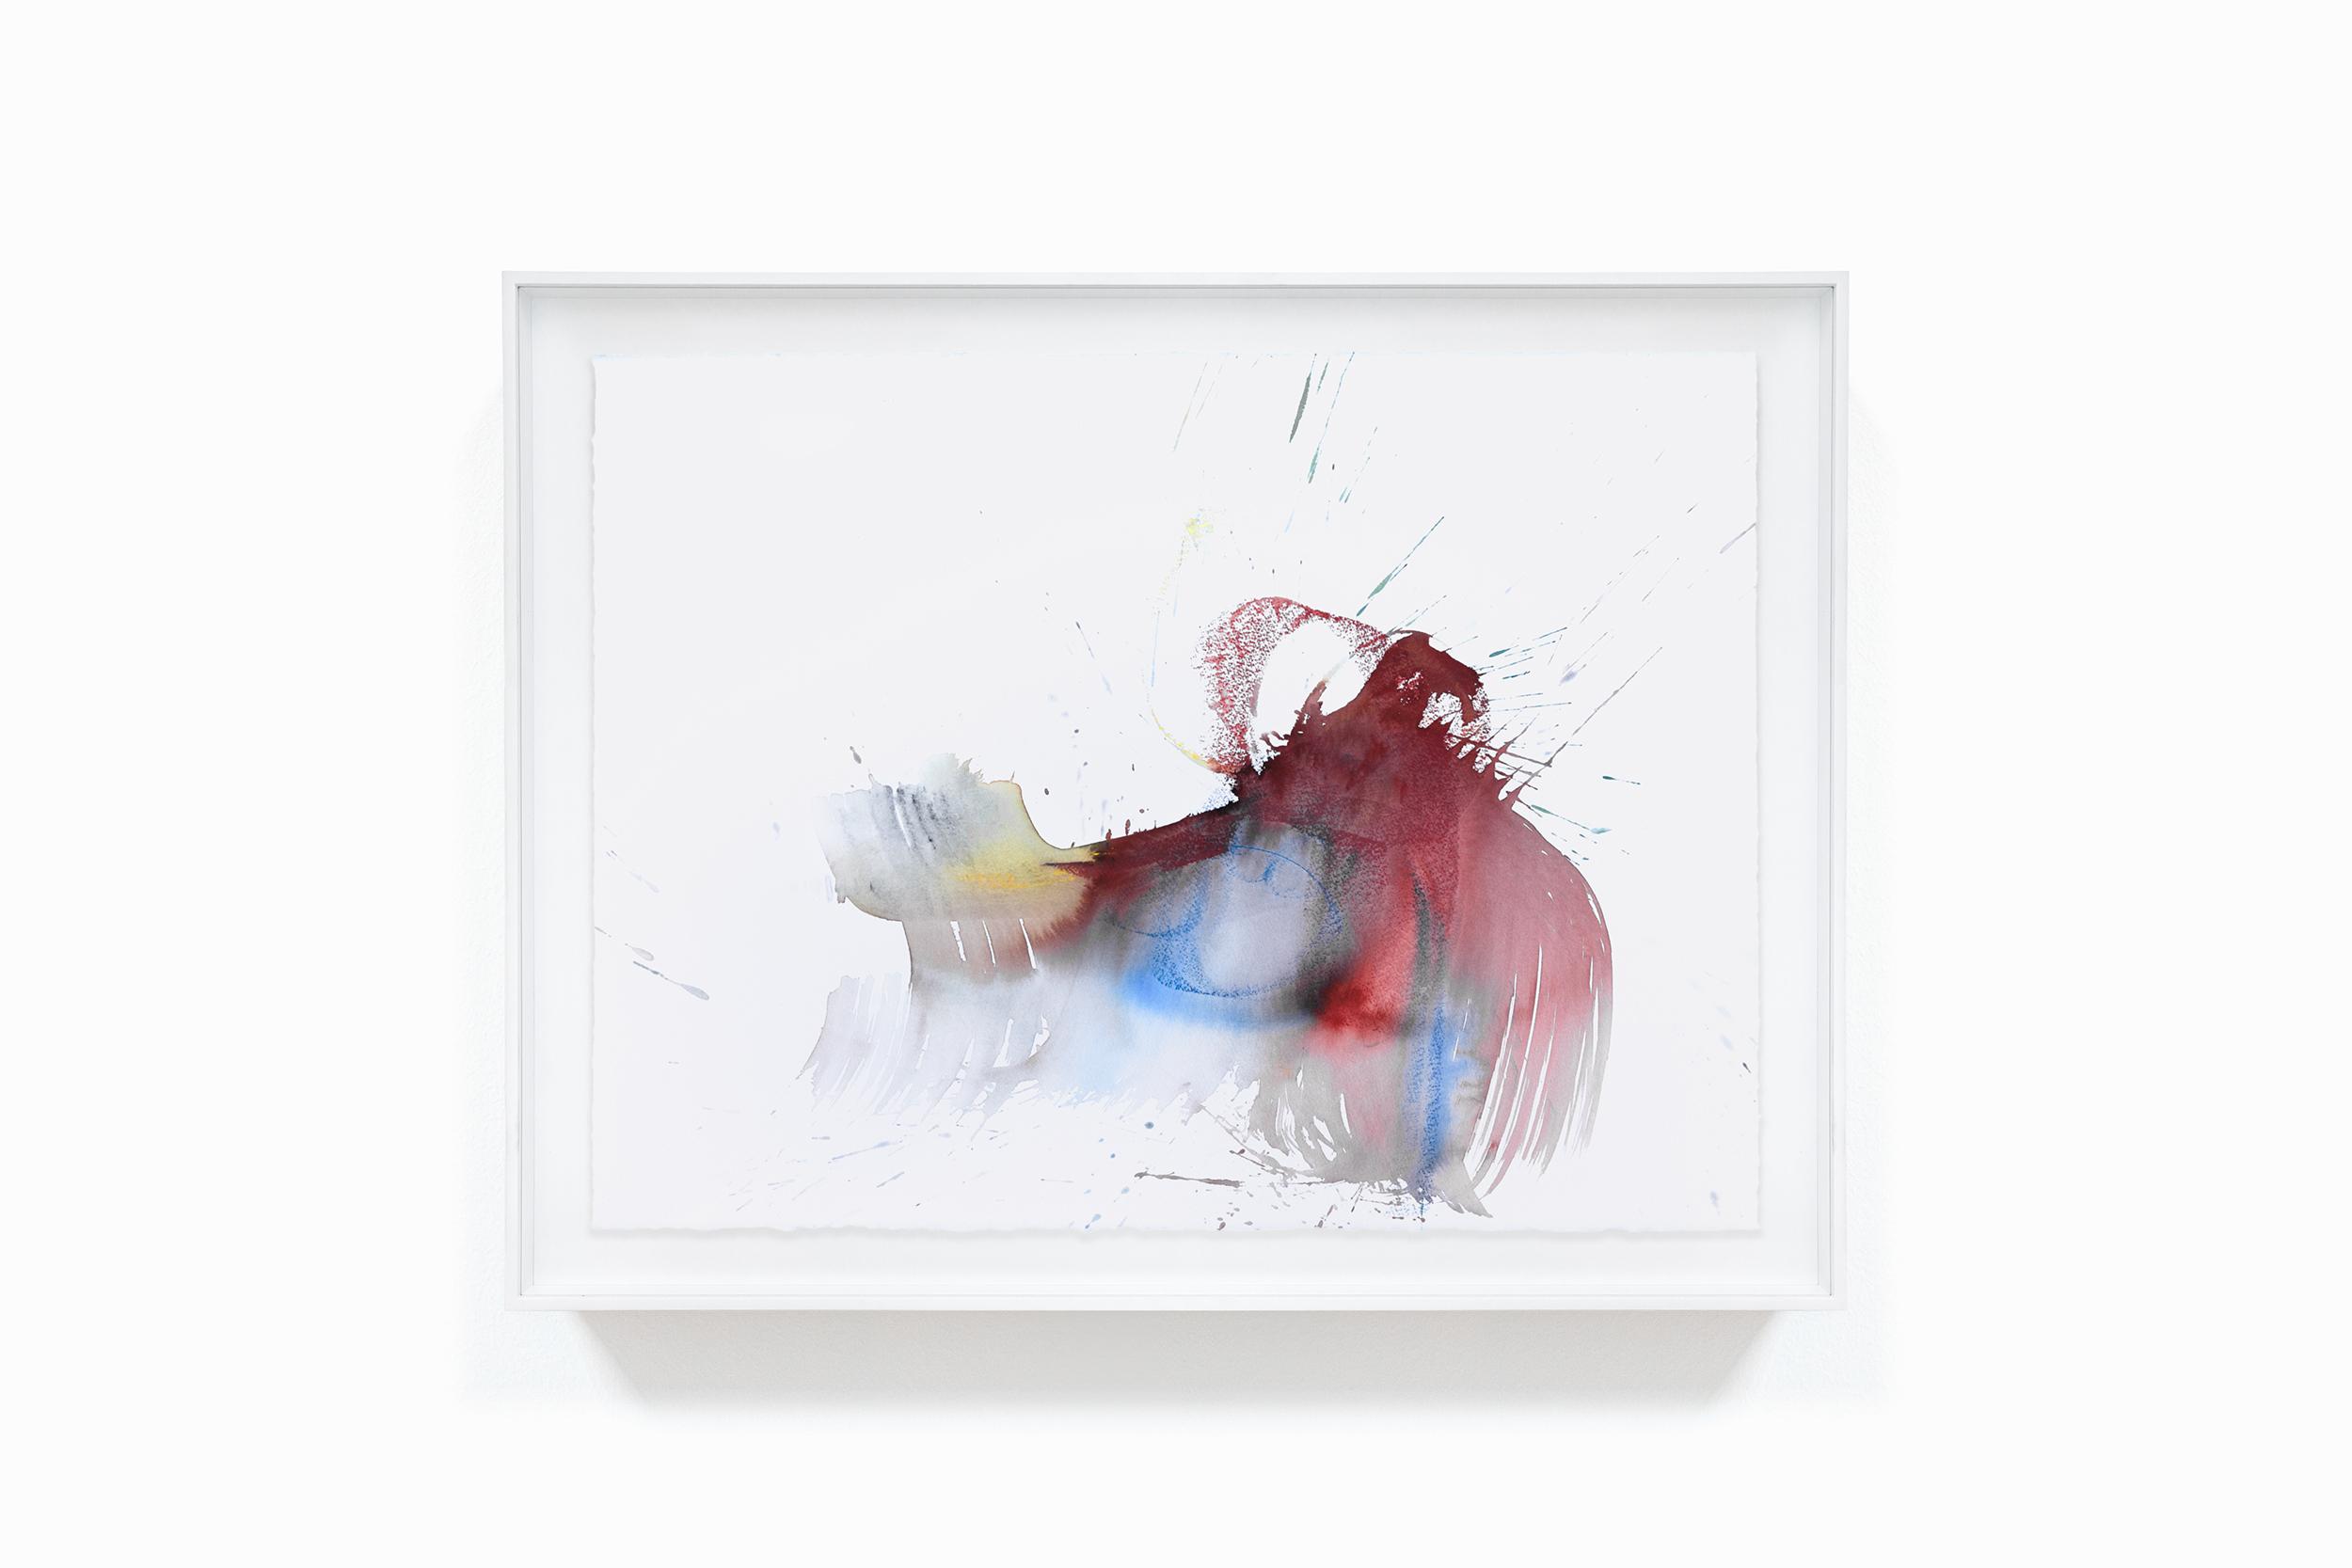 099D Andre Gigante Pintura Painting bonjourmolotov La.jpg